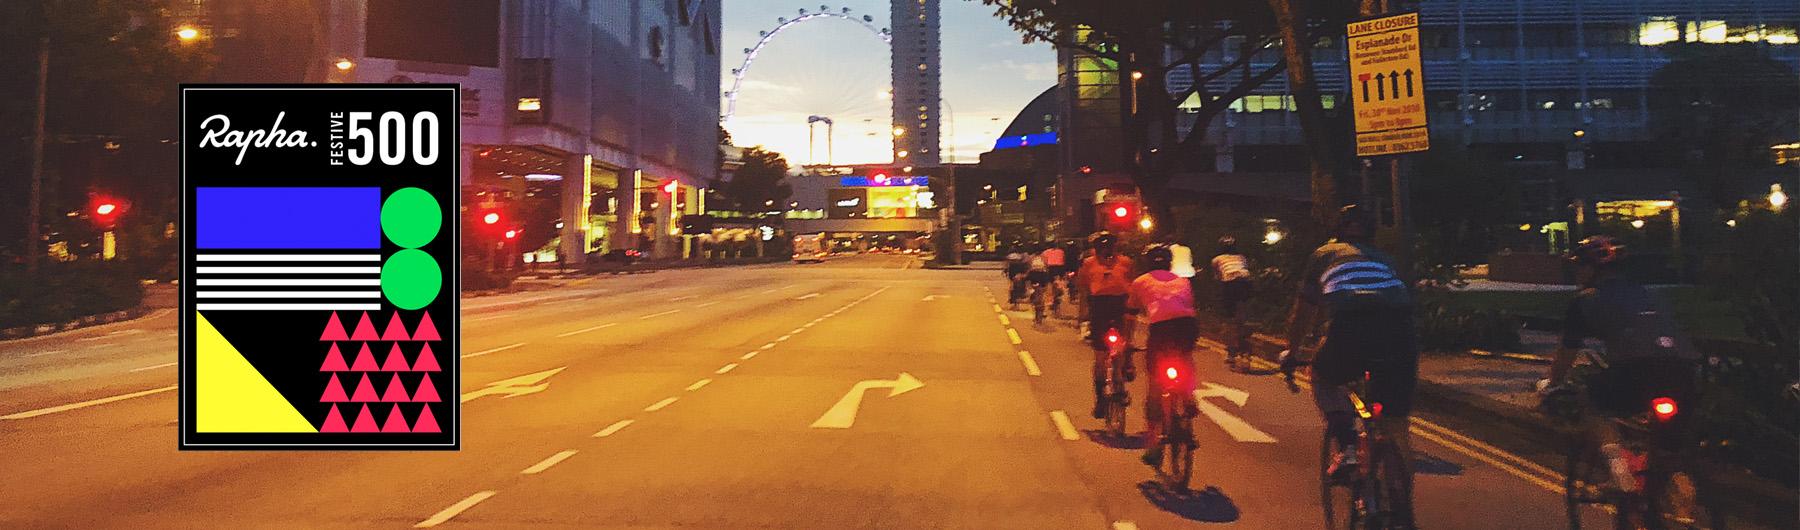 Rapha Singapore Festive 500 Ride 4 | 5.30am, Friday 28th December | Macritchie Reservoir Drop Off Point